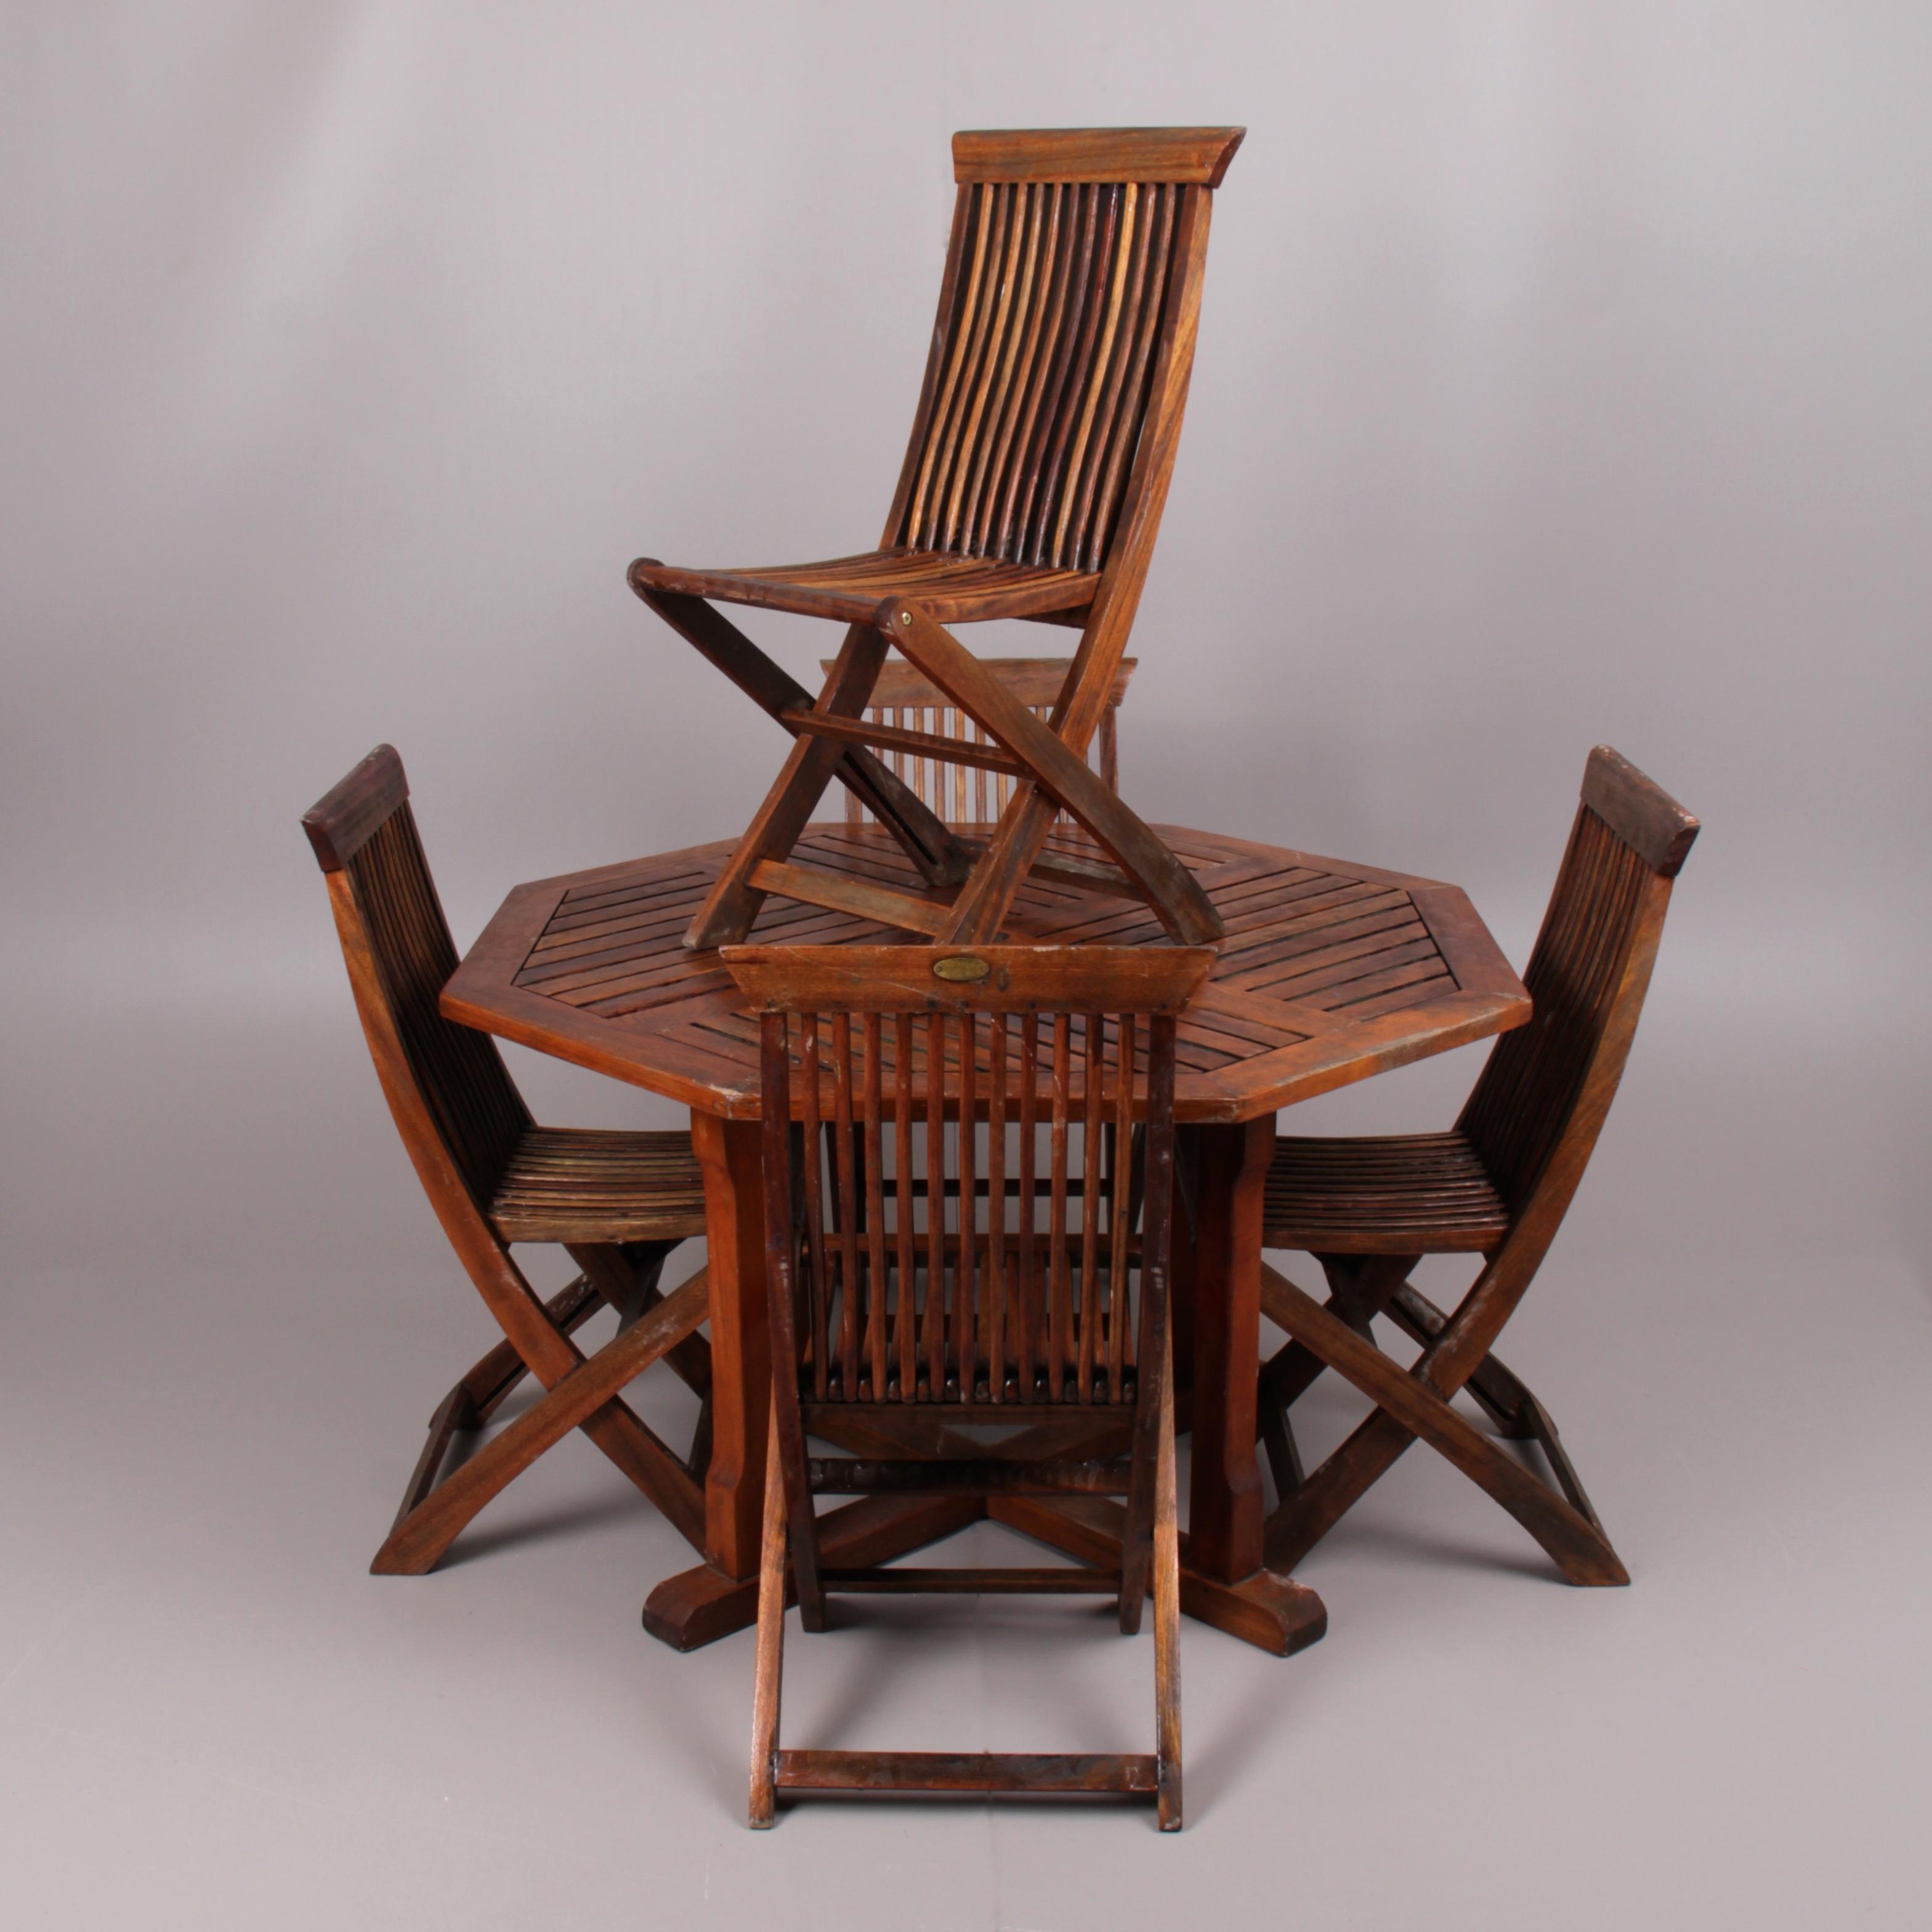 Tradgardsmobel 6 Delar Teak Scancom Furniture Garden Furniture